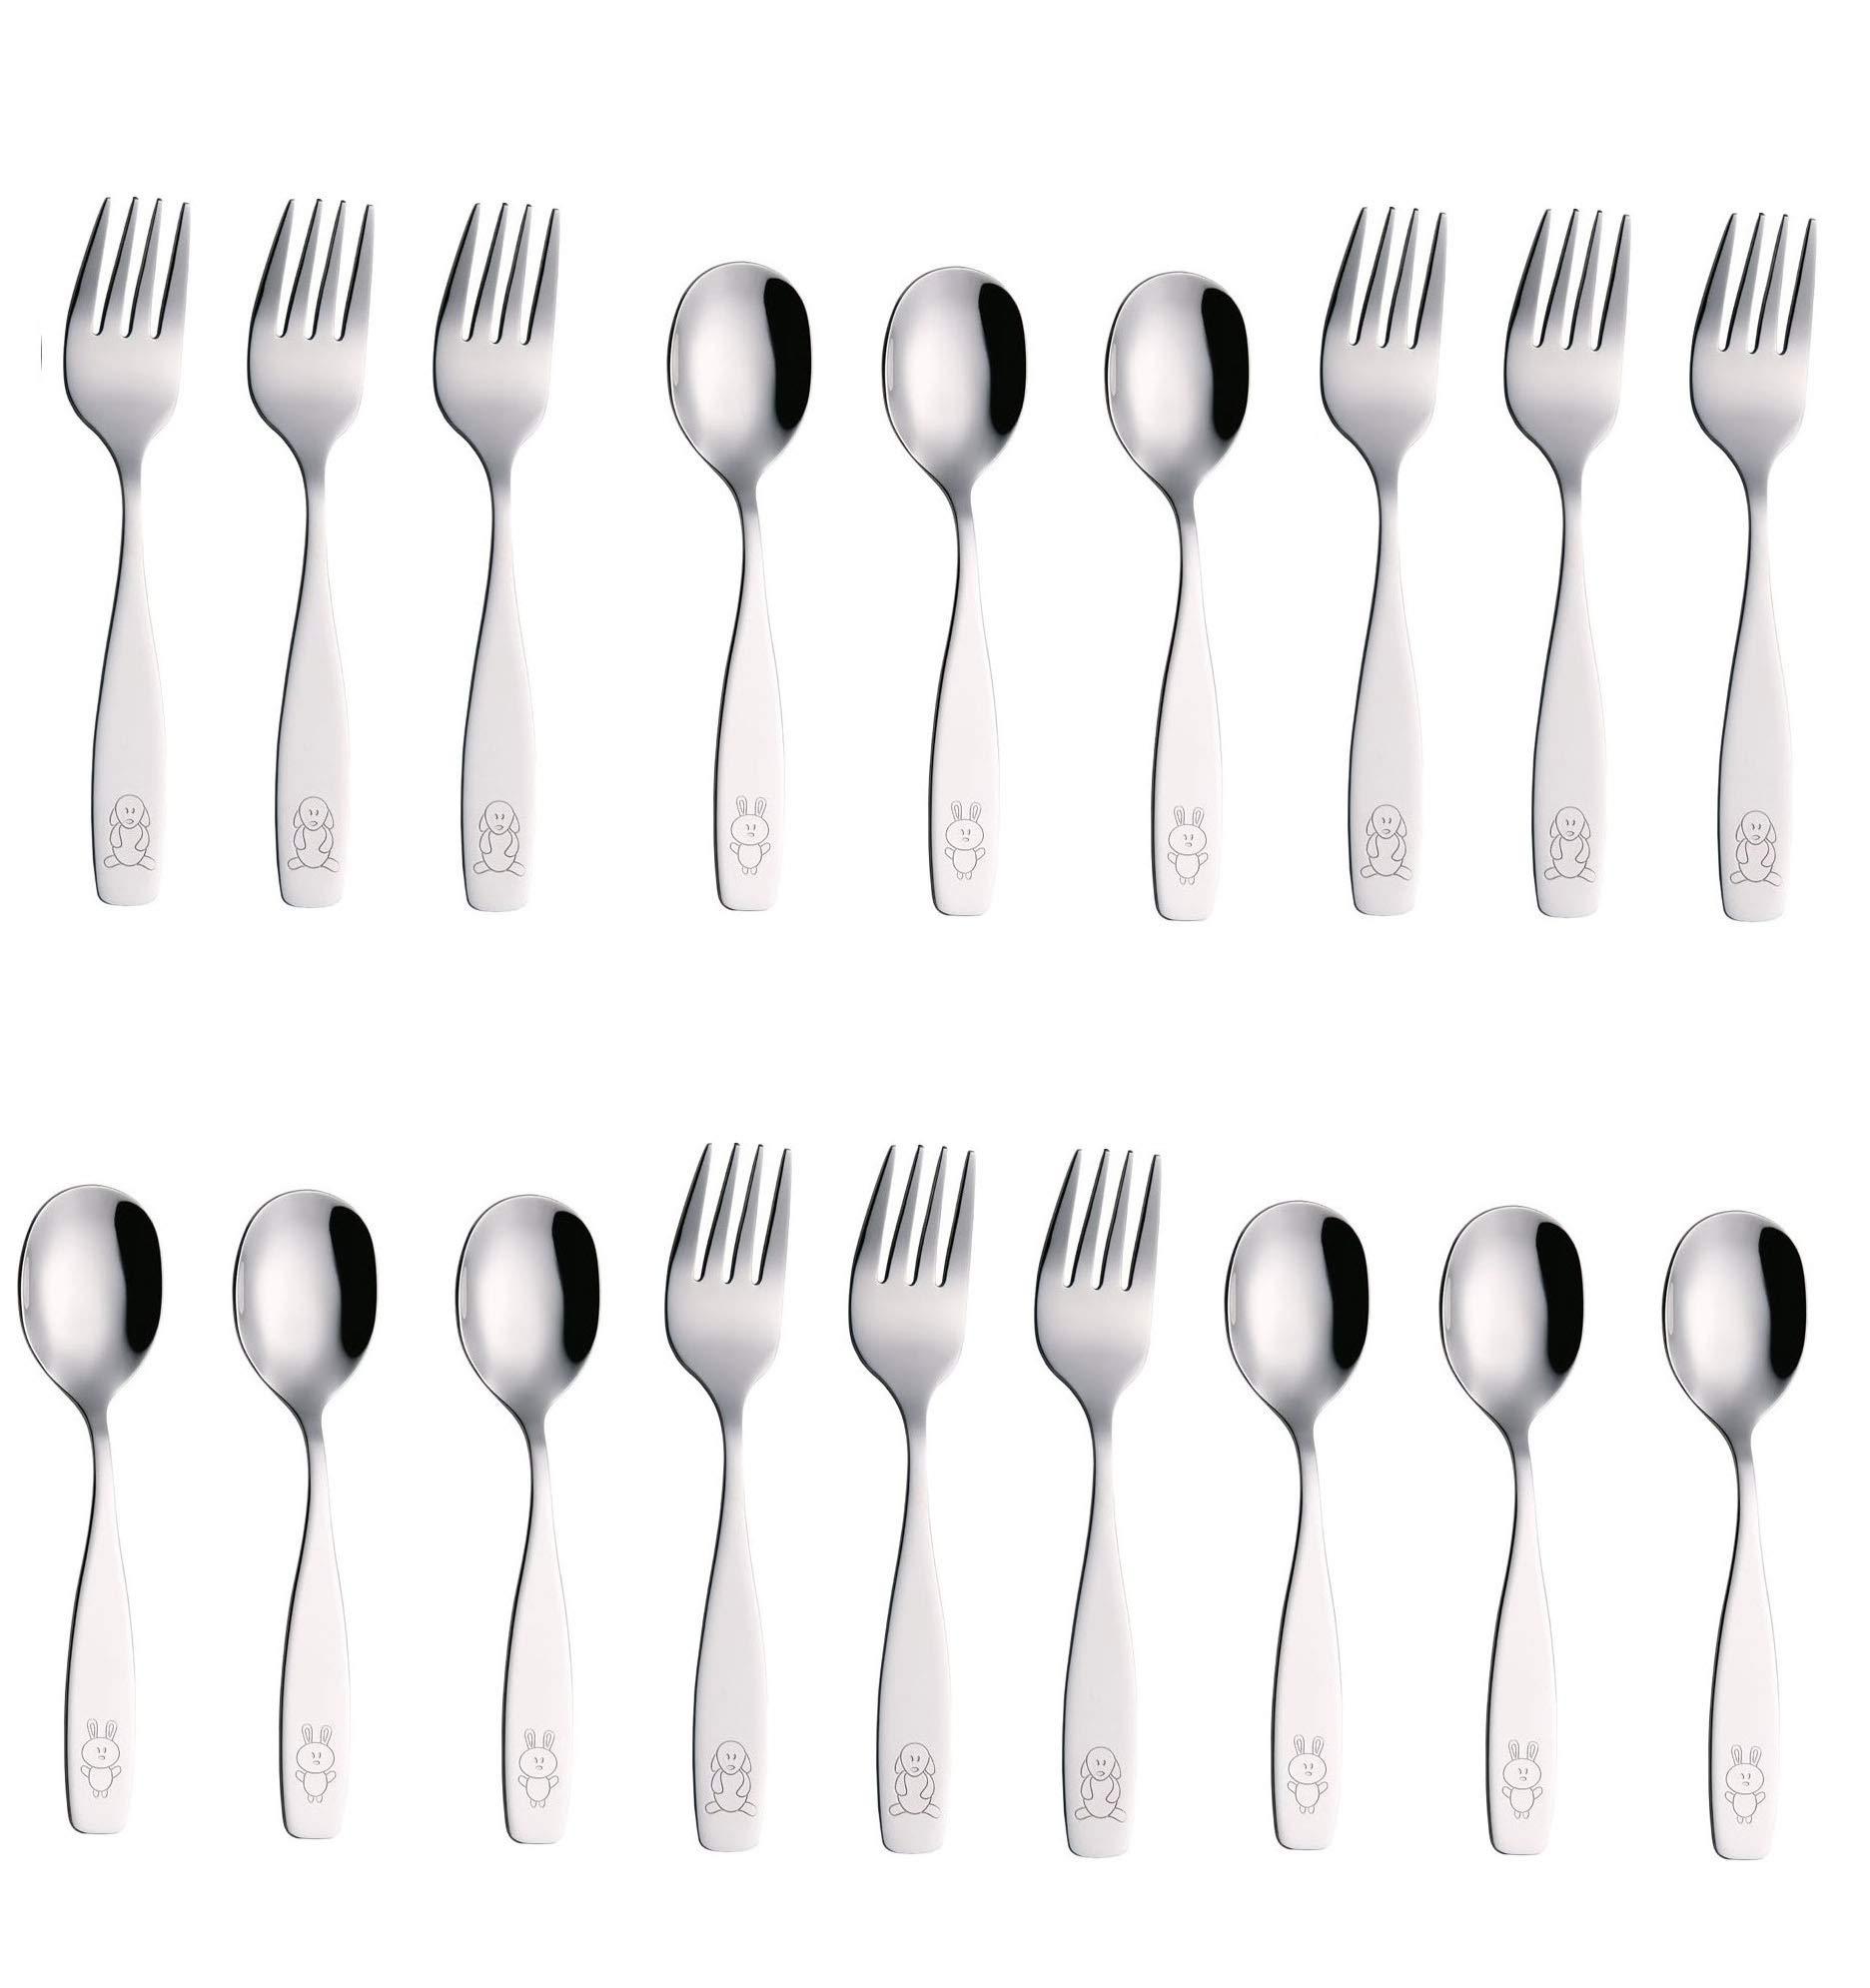 Exzact Stainless Steel 18 Pieces Childrens Flatware/Kids Silverware/Cutlery Set - 9 x Children Forks, 9 x Children Dinner Spoons - Safe Toddler Utensils (Engraved Dog Cat Bunny)(WF850-S18FS)